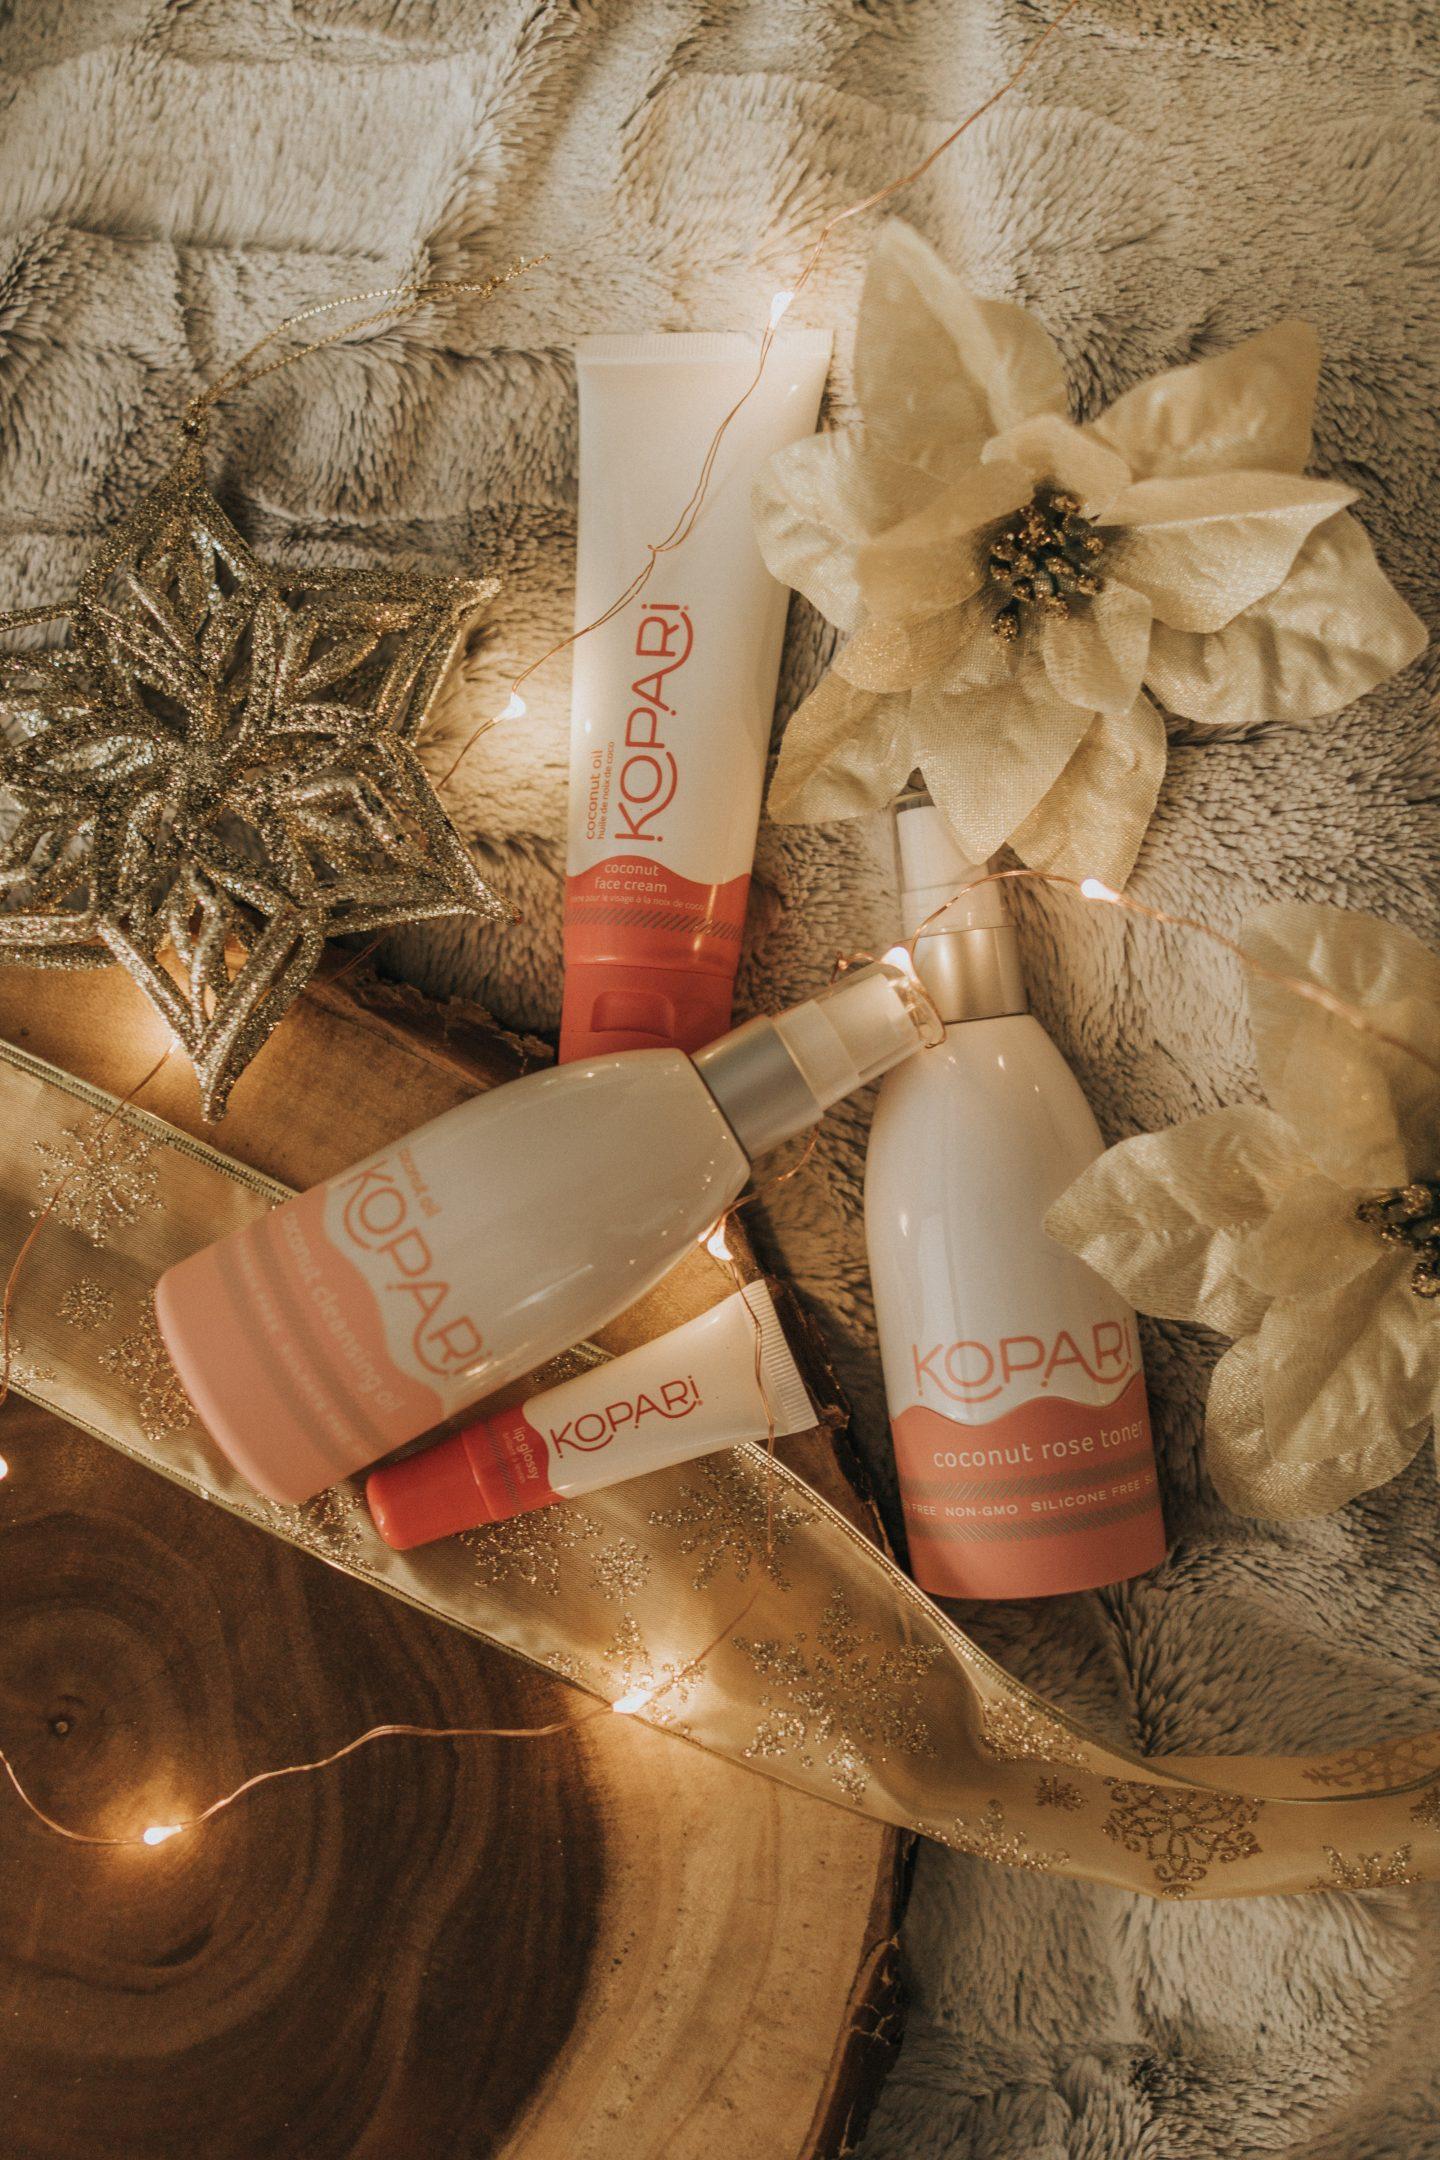 Kopari Beauty Skincare | Skincare Routine